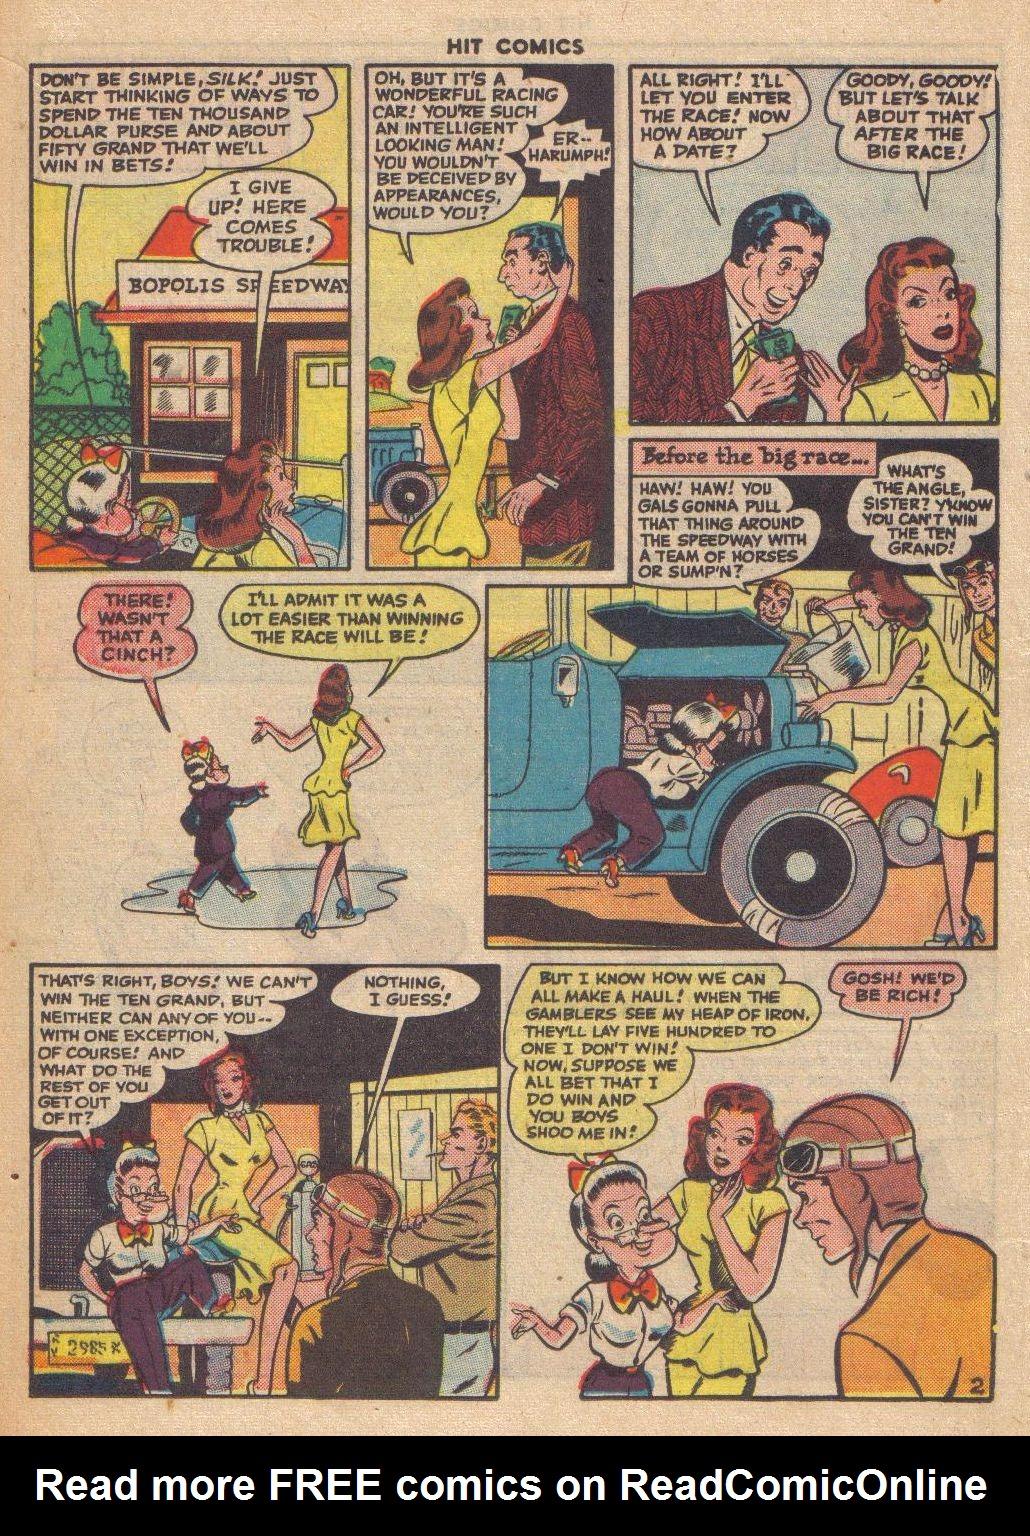 Read online Hit Comics comic -  Issue #46 - 20